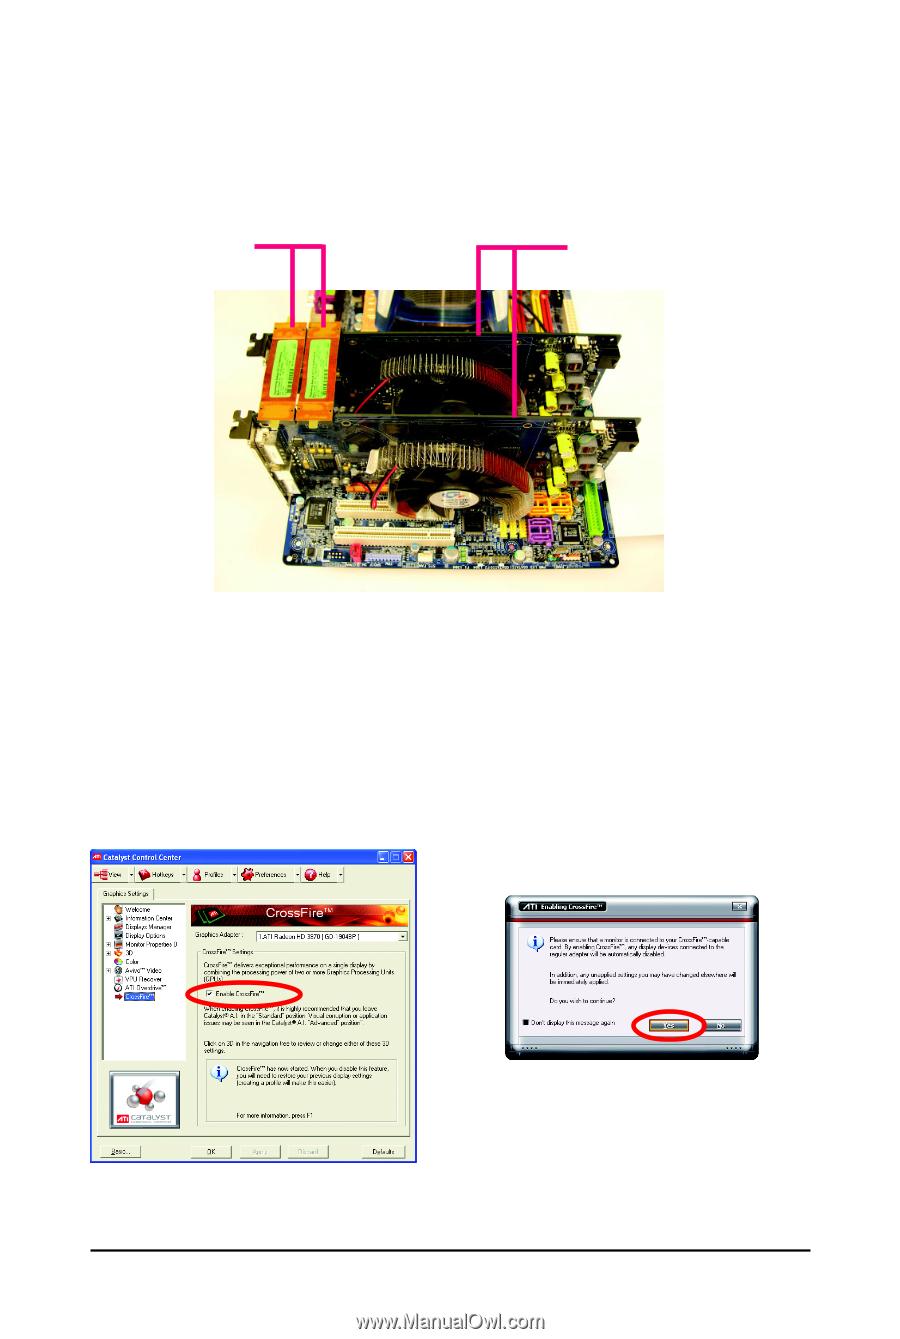 GIGABYTE GV-RX387512HP ATI HDMI AUDIO DRIVERS WINDOWS XP